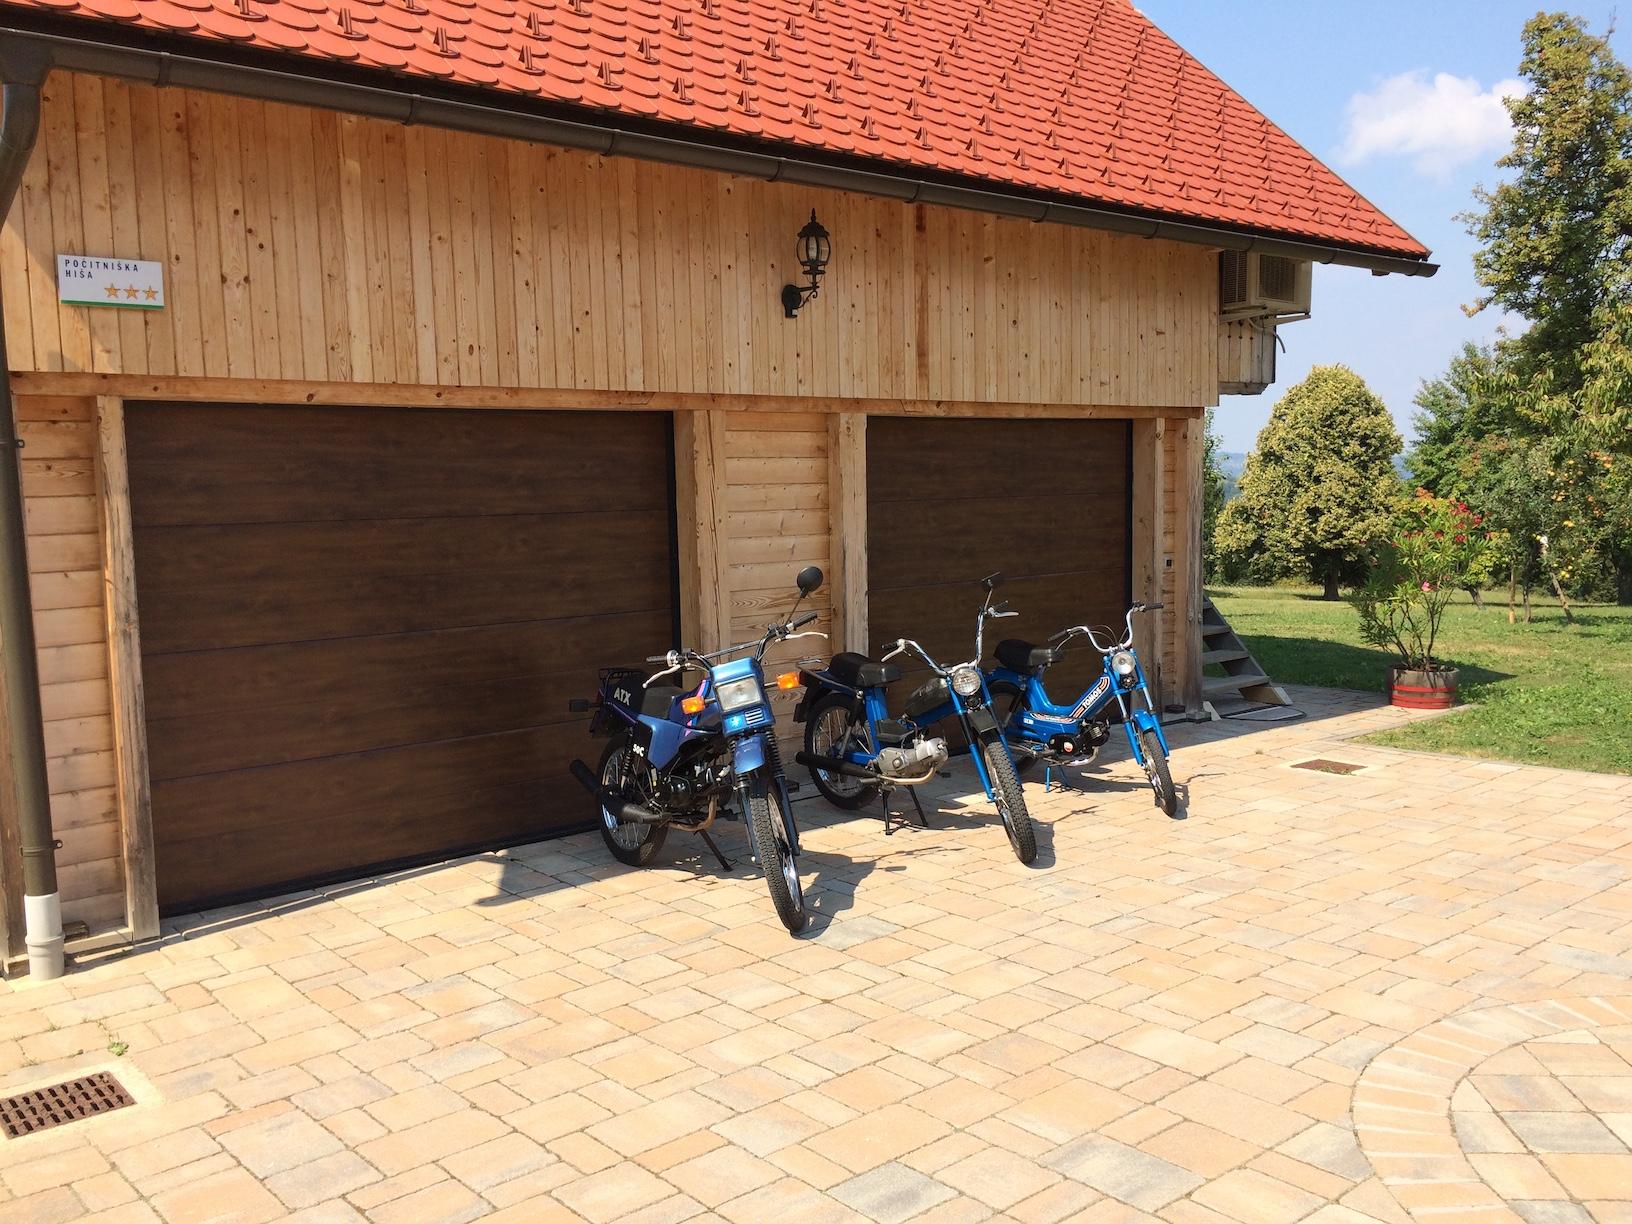 Rent TOMOS moped2